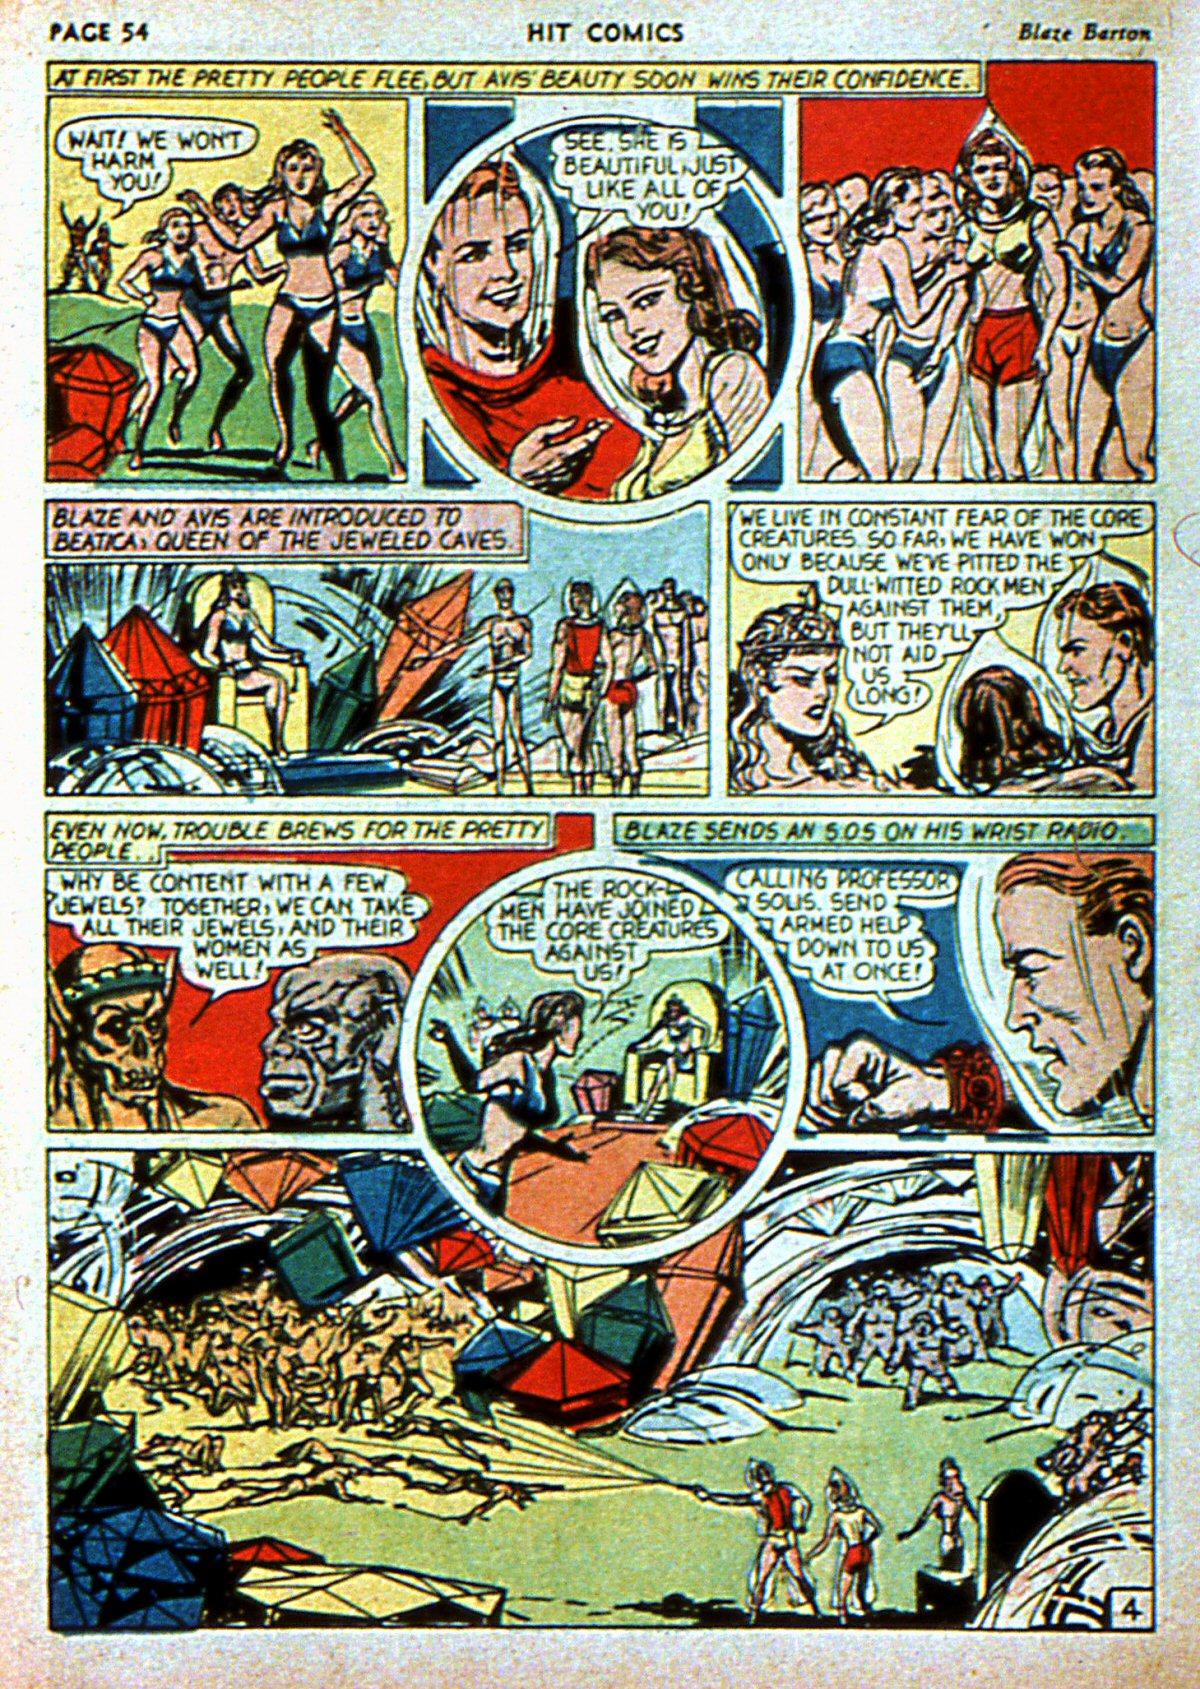 Read online Hit Comics comic -  Issue #3 - 56